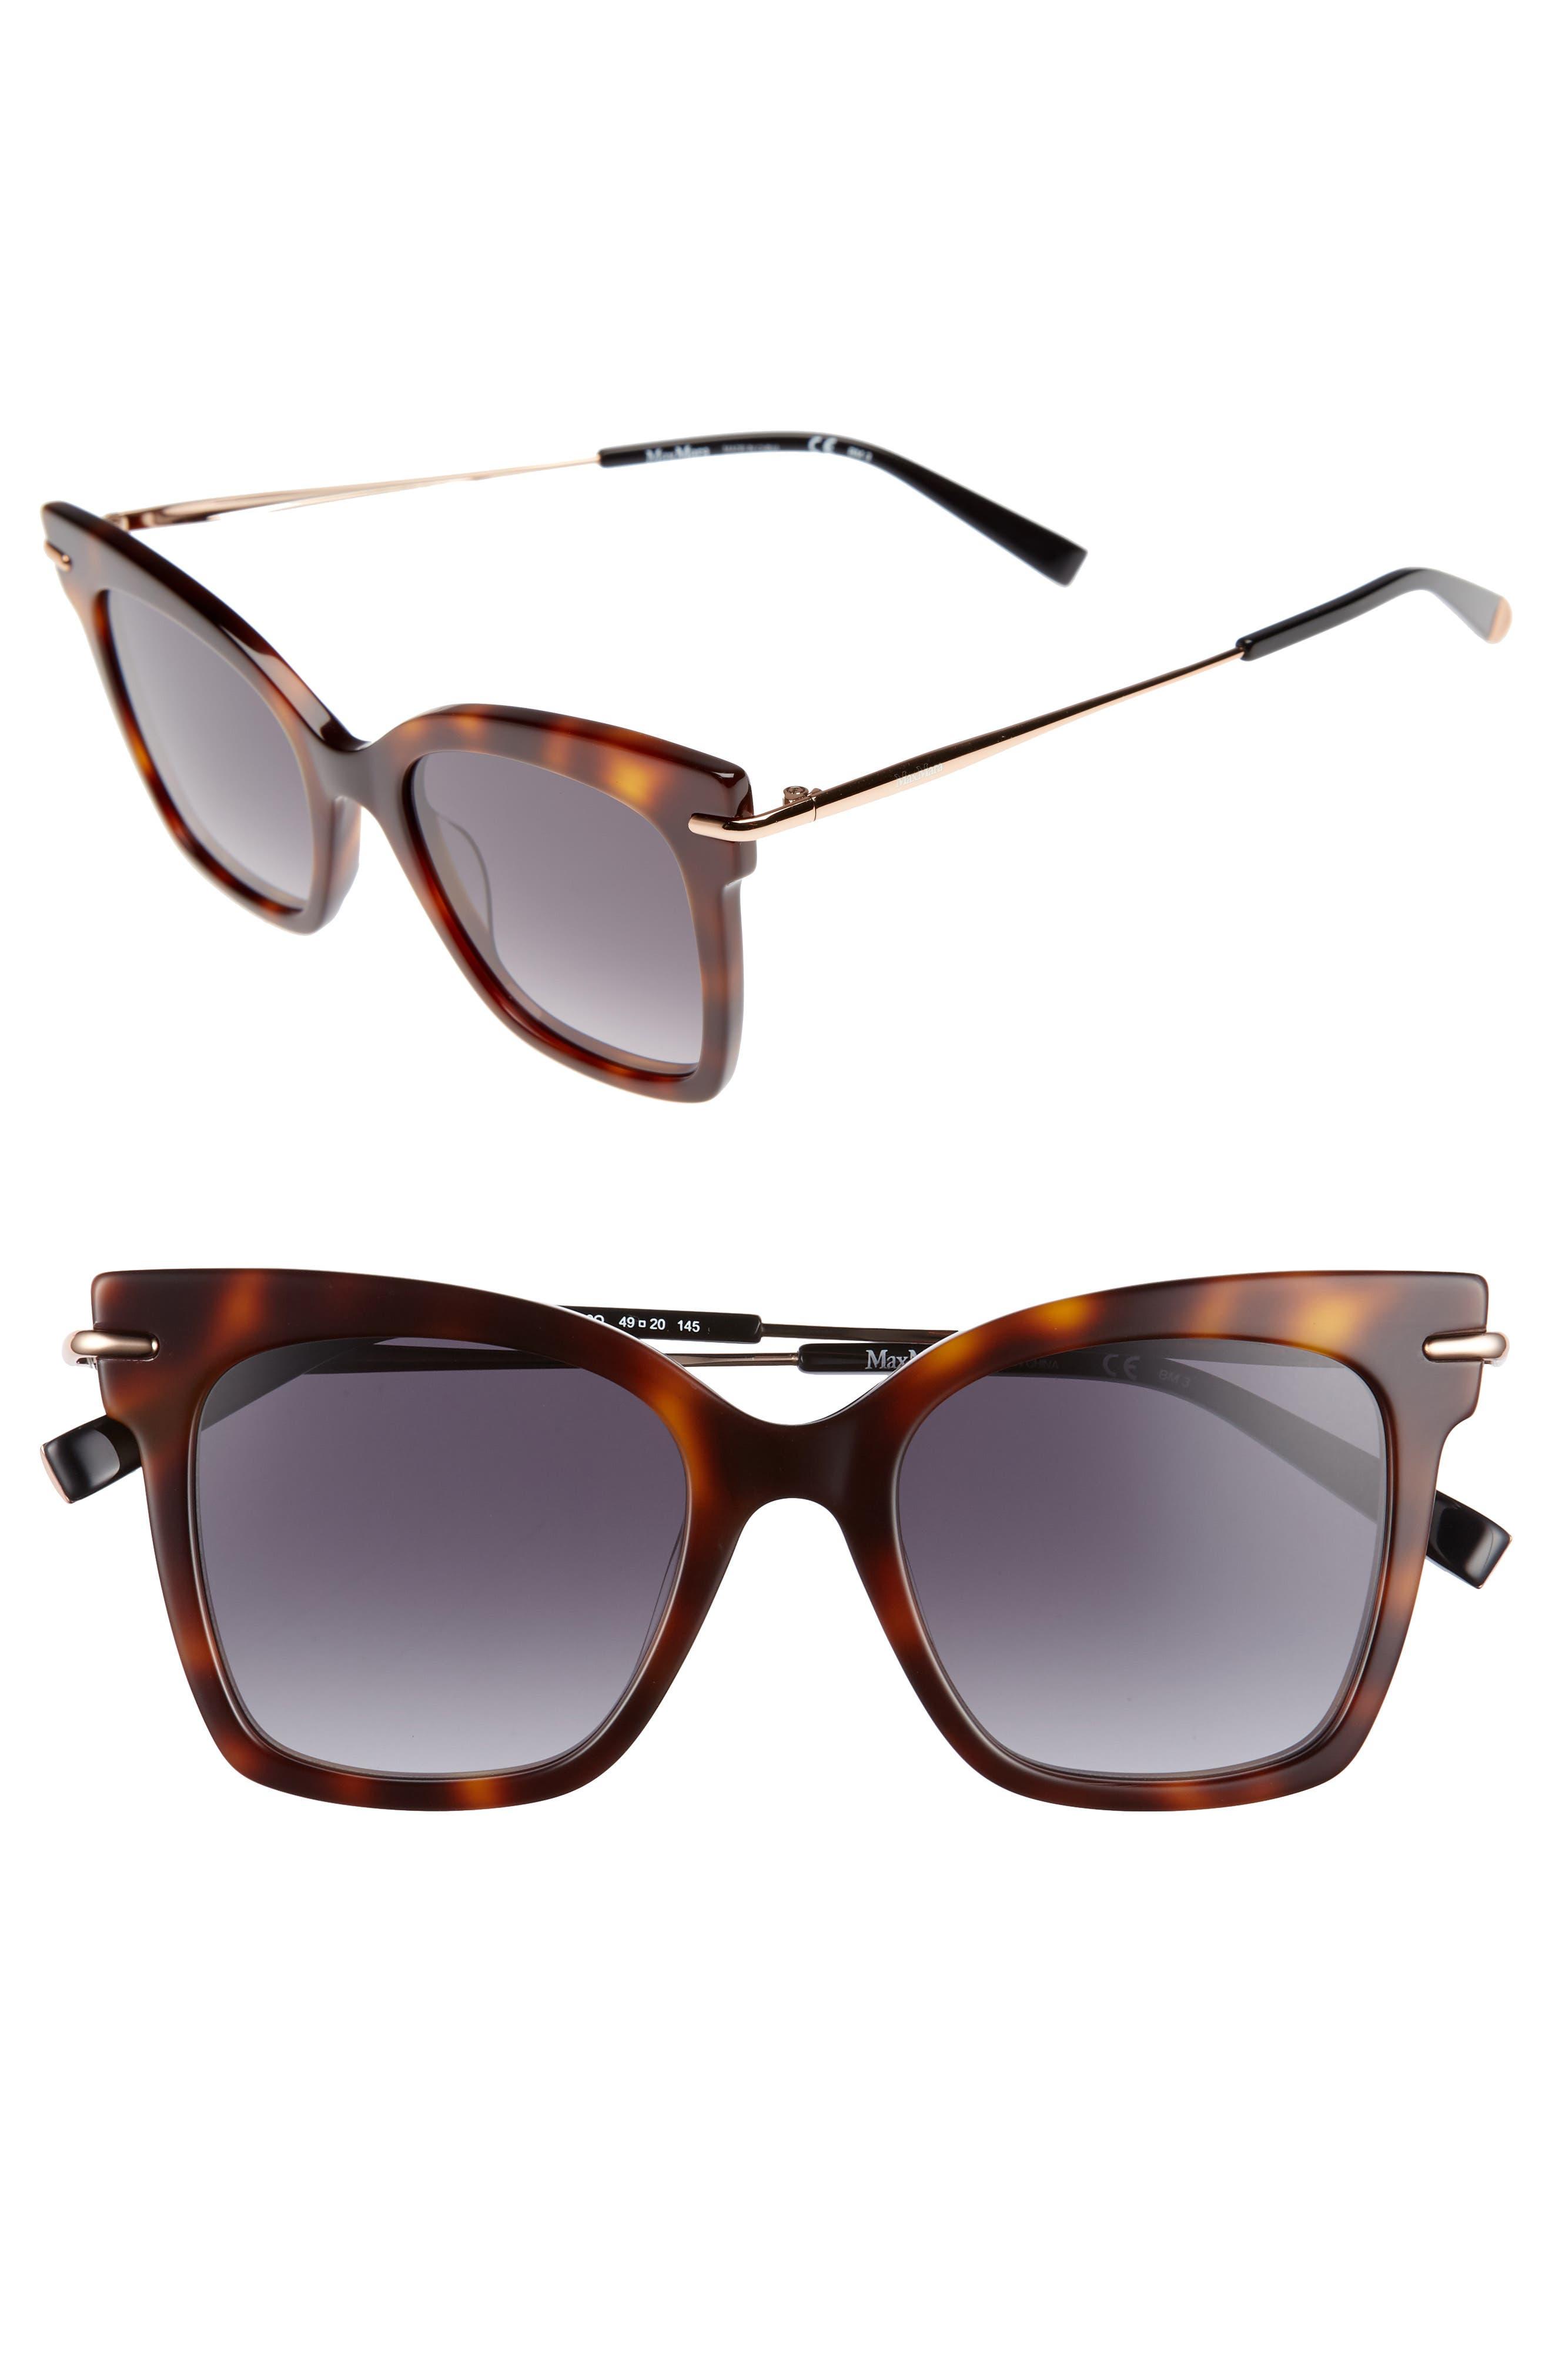 Needliv 49mm Gradient Cat Eye Sunglasses,                         Main,                         color, 001